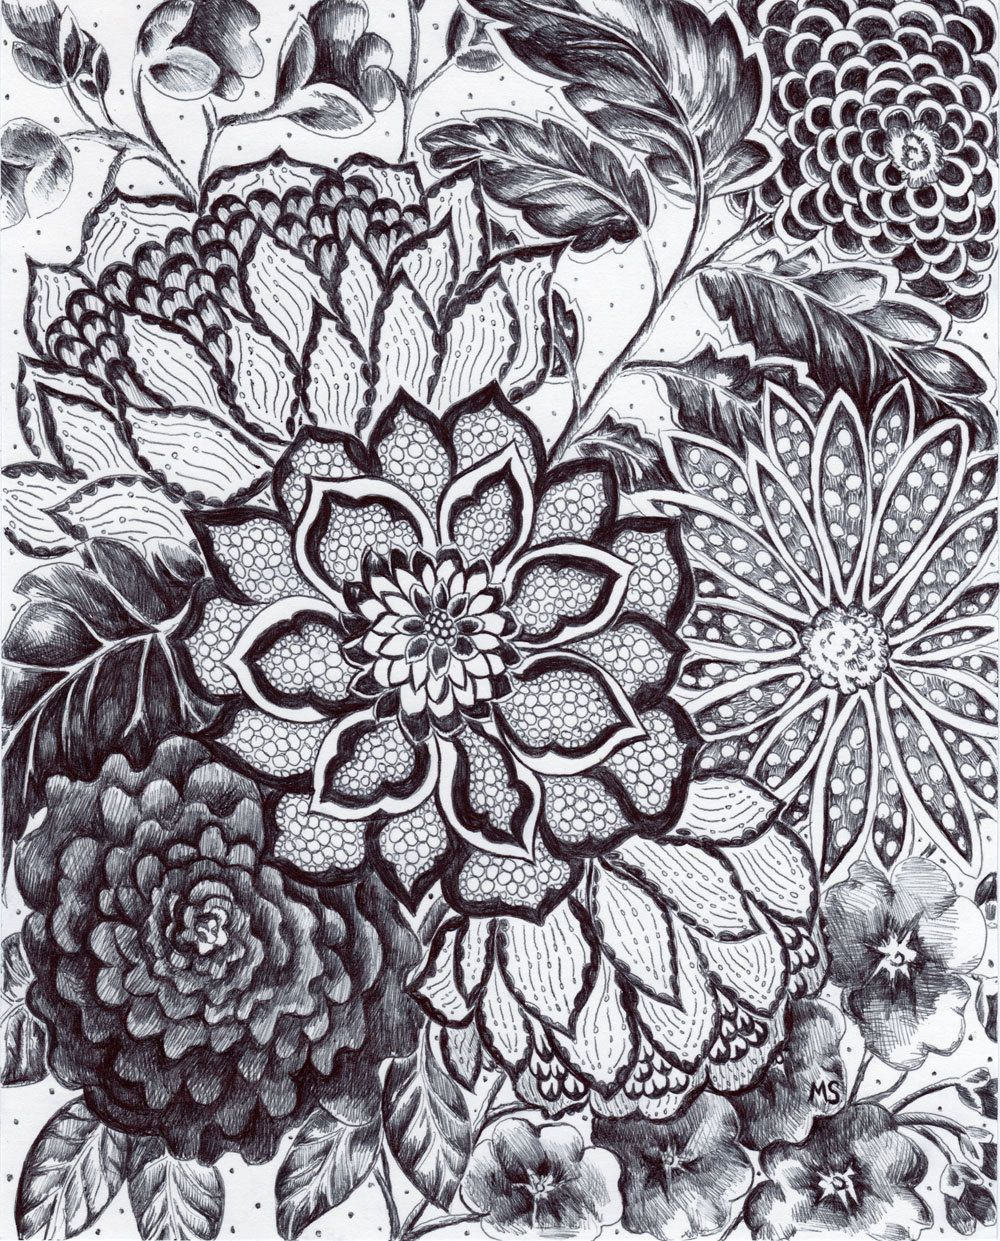 17 Best images about Flower patterns on Pinterest | Flower line ...